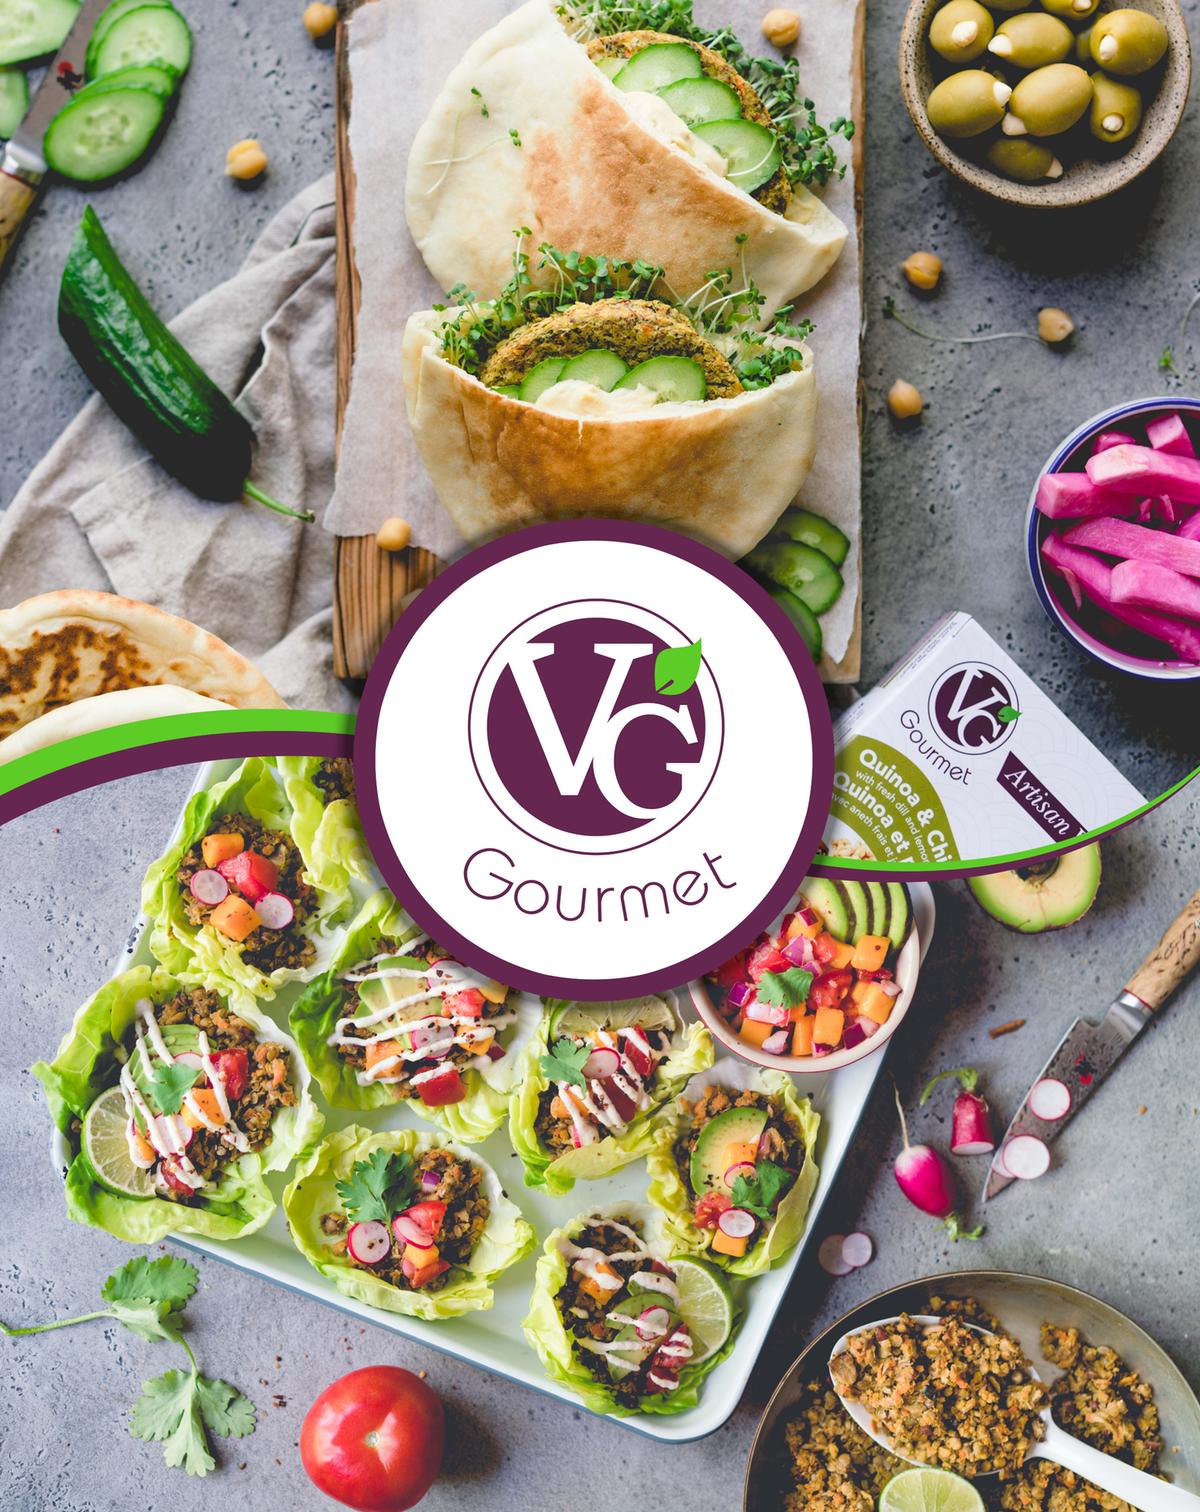 VG Gourmet Trade Show Banner